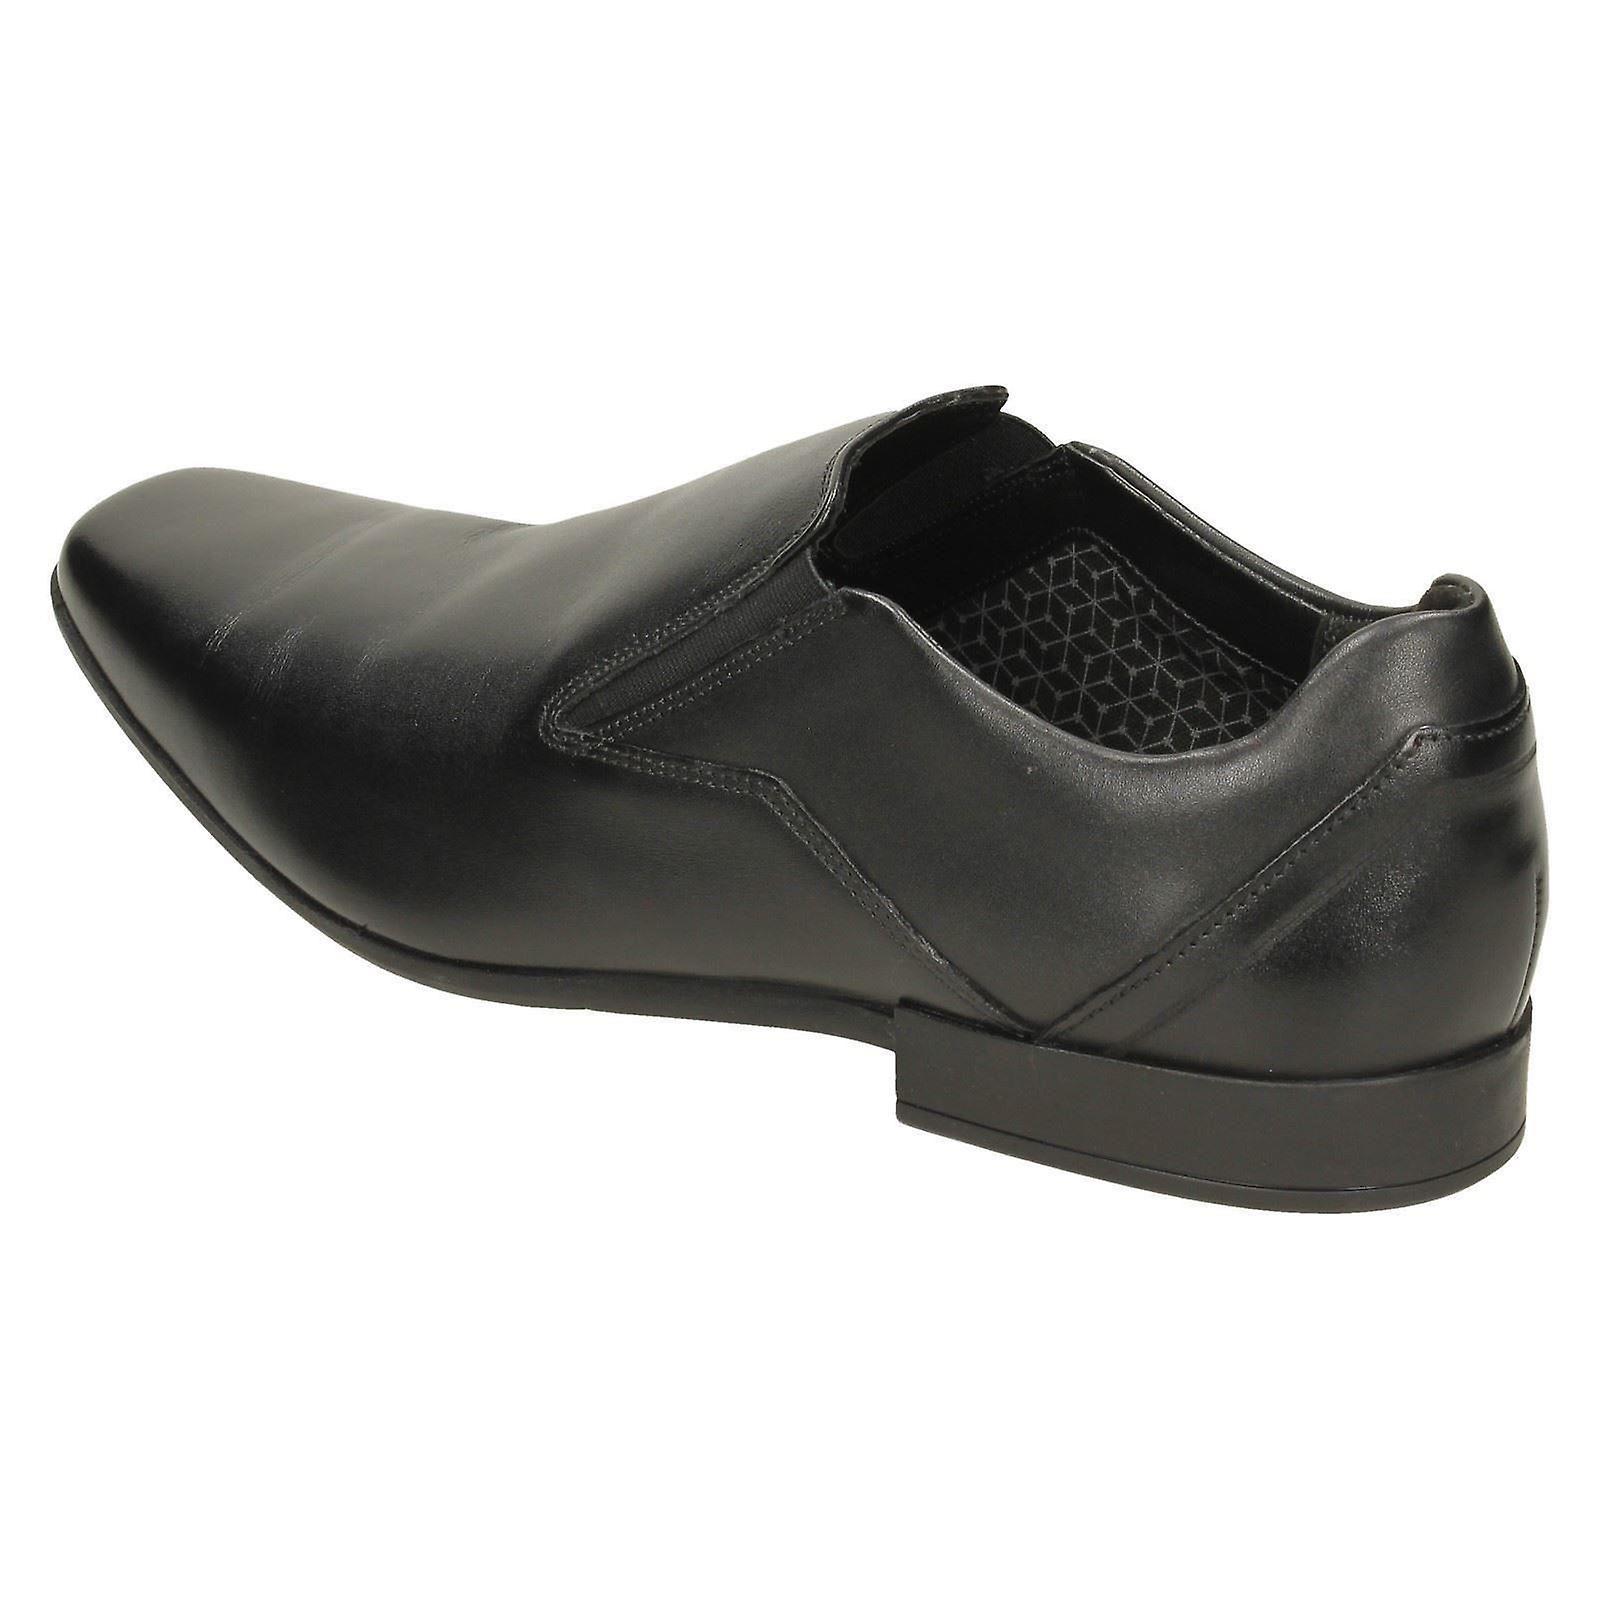 US Glement Black Leather Size Slip 43 Shoes 10M Formal UK 9G EU Size Mens Clarks Size wOqxffR